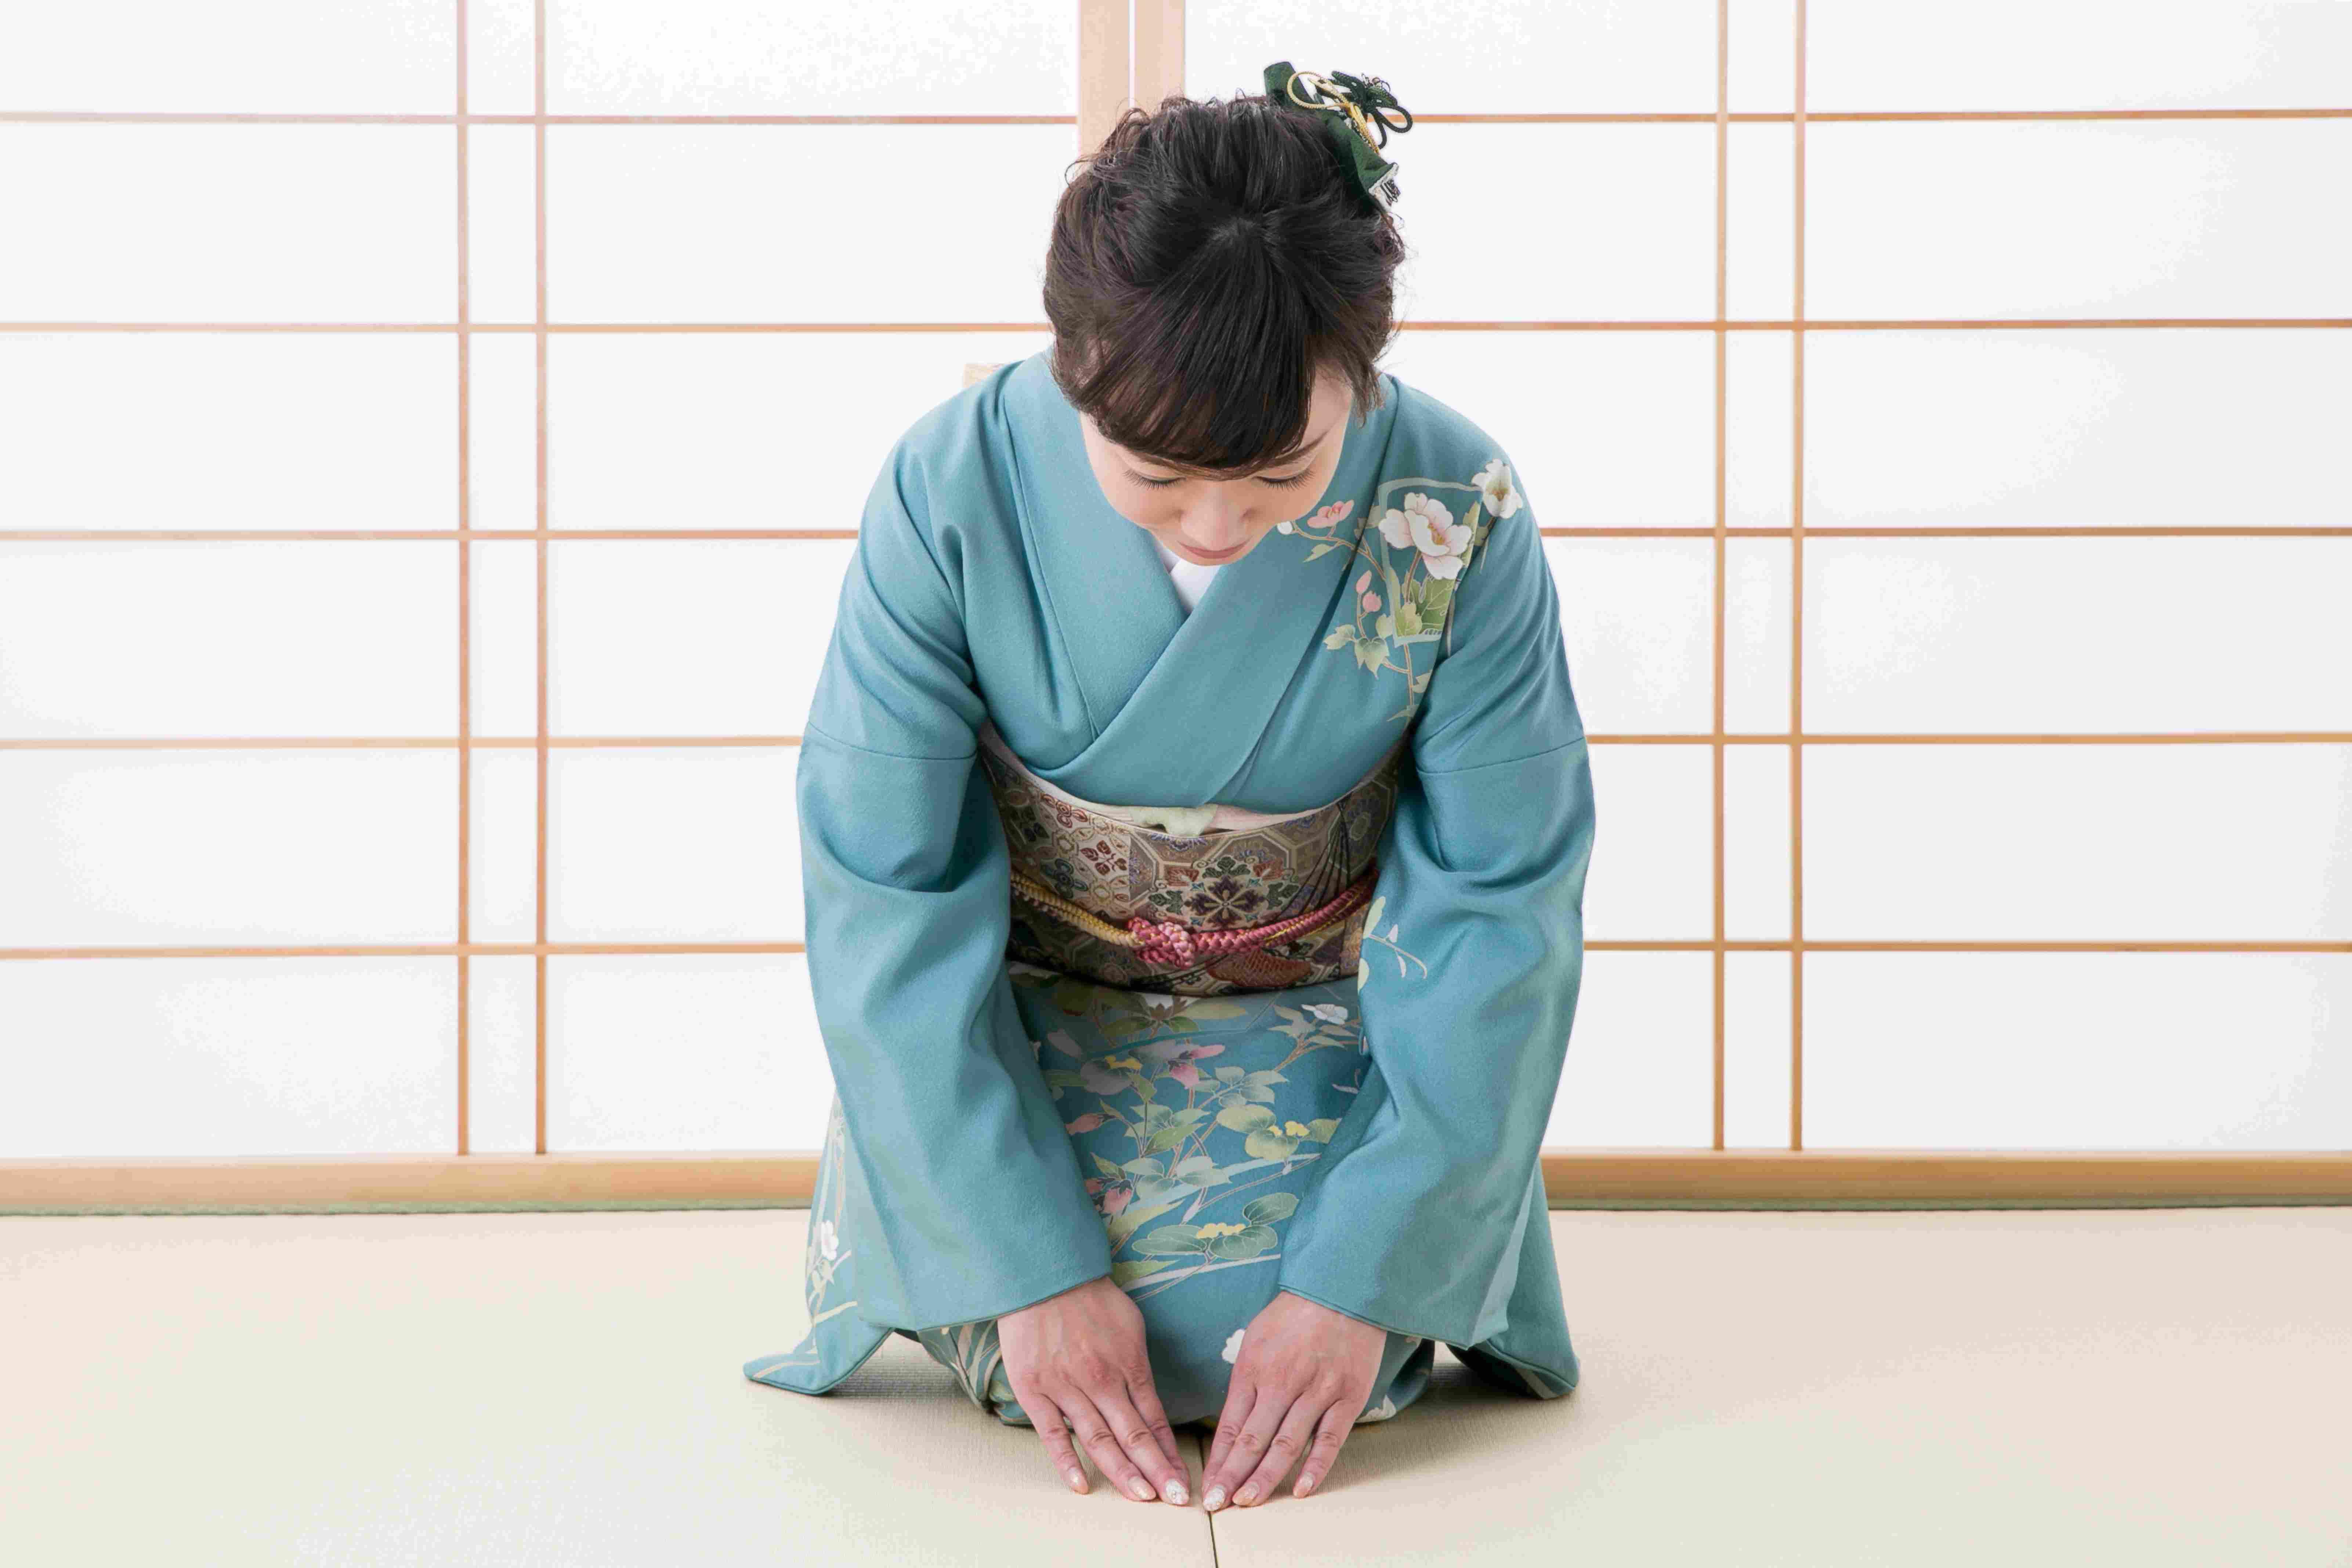 Discipline and Politeness, two big essential Japanese qualities./規律と礼儀正しさ、二つの重要な日本のクオリティー